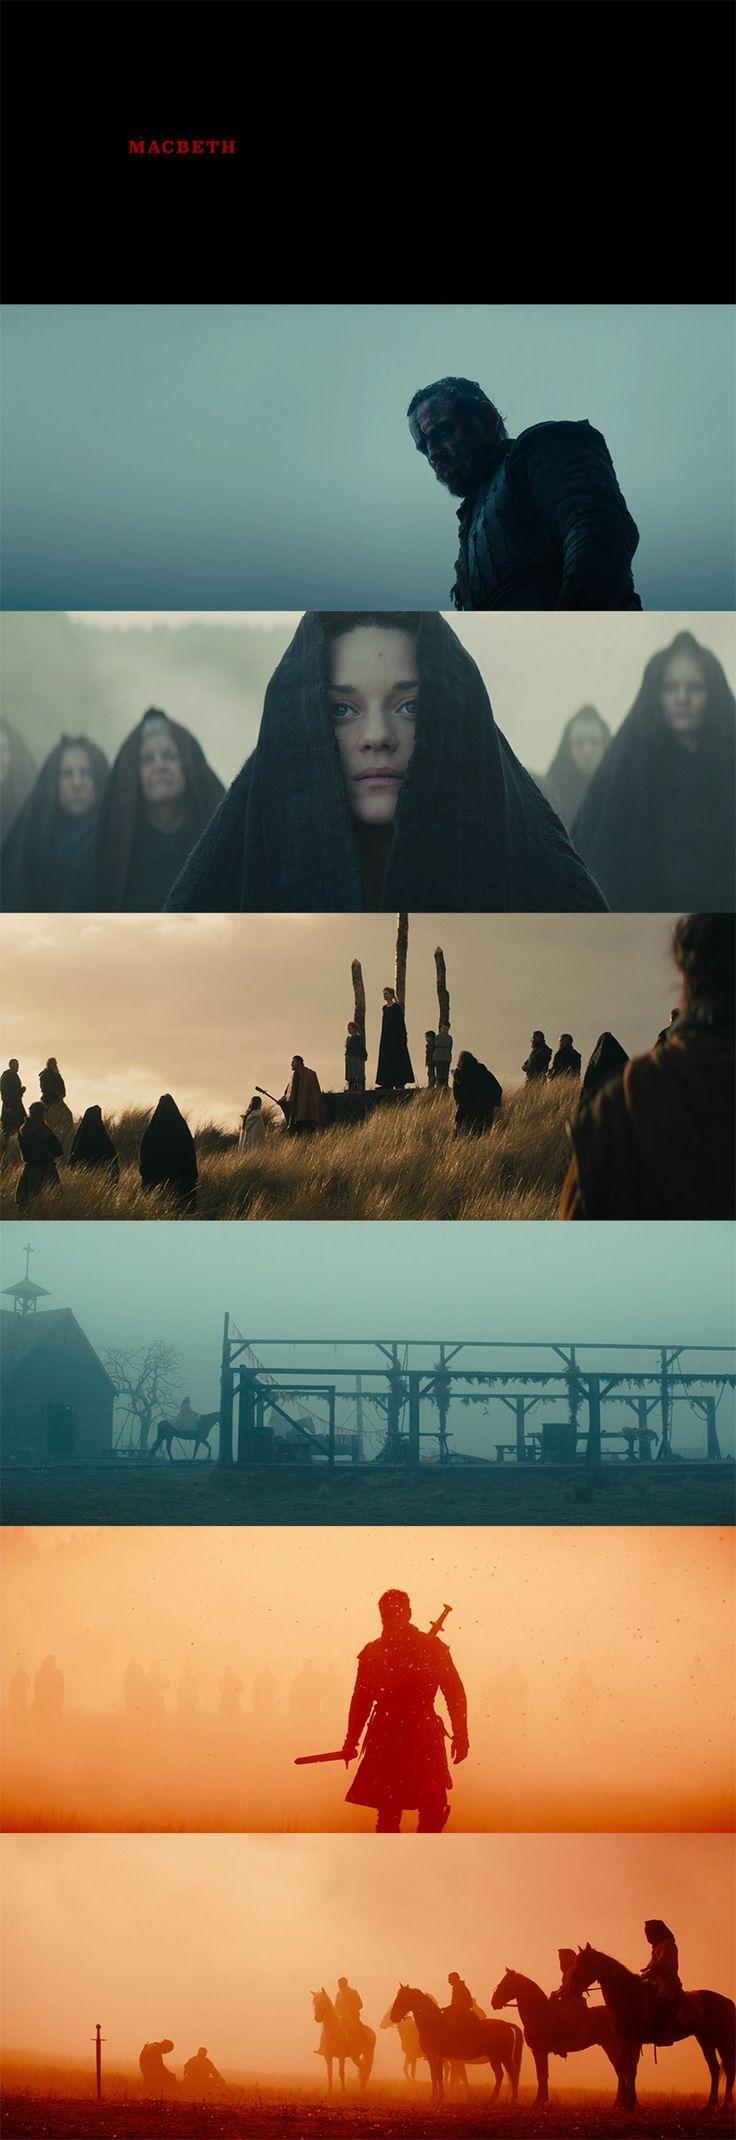 Macbeth (2015) - Cinematography by Adam Arkapaw | Directed by Justin Kurzel